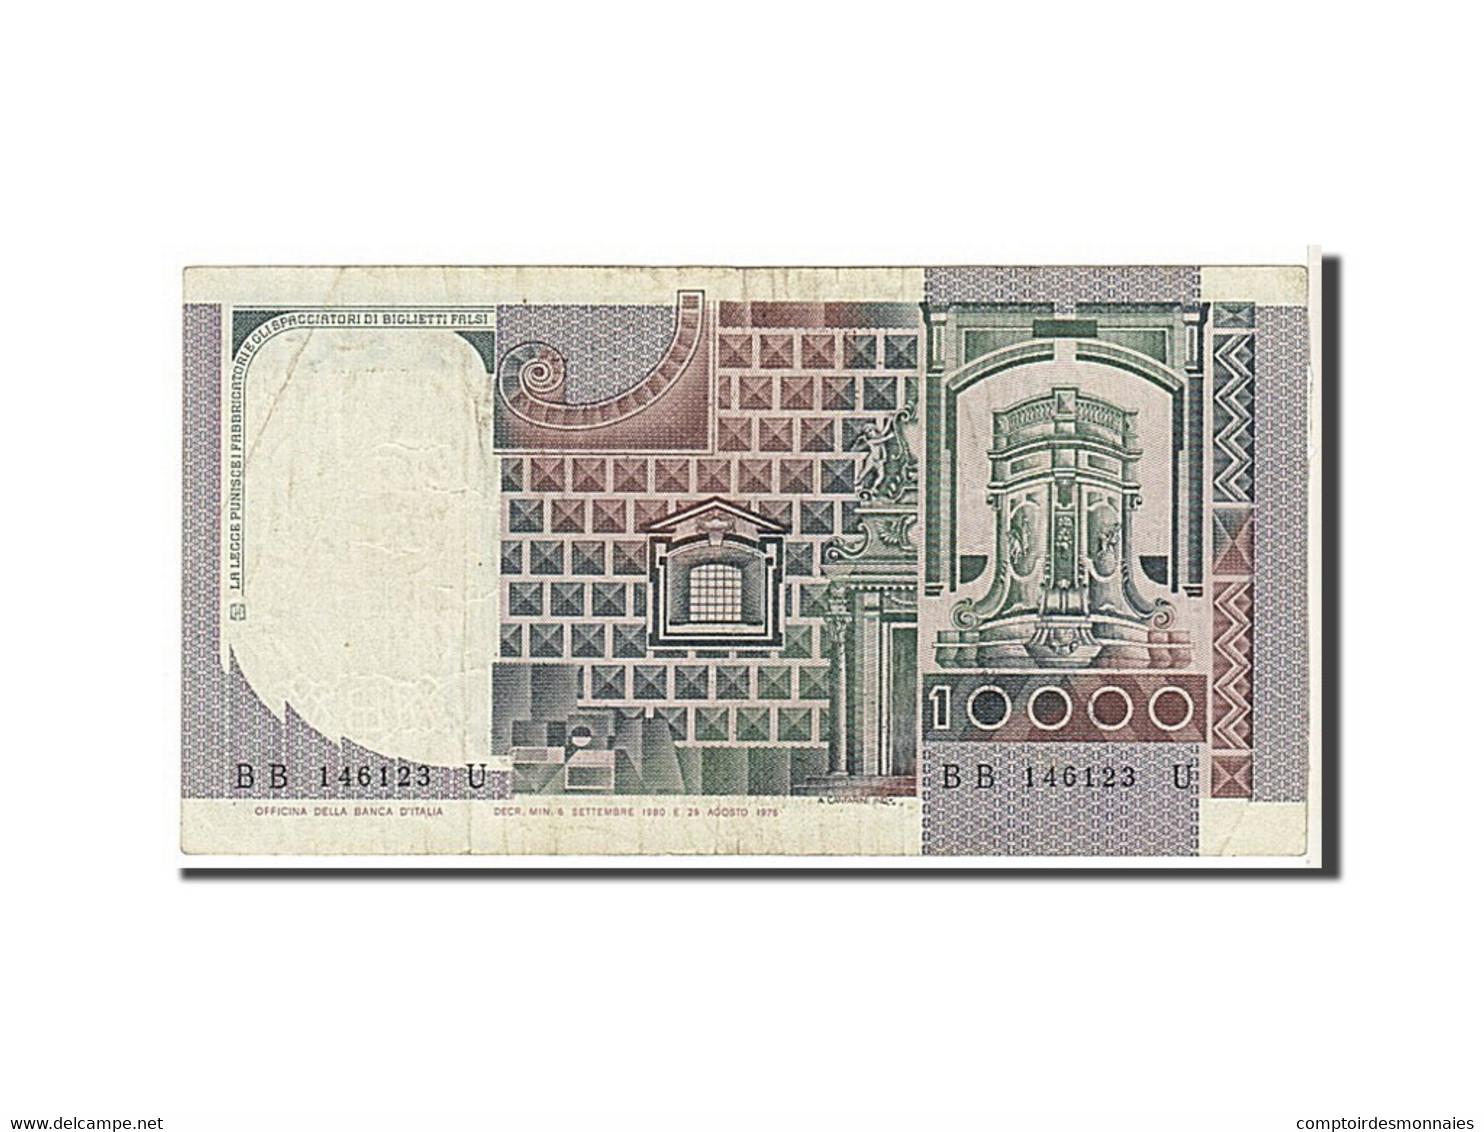 [#111573] Italie, 10 000 Lire Type 1980 - 10000 Lire